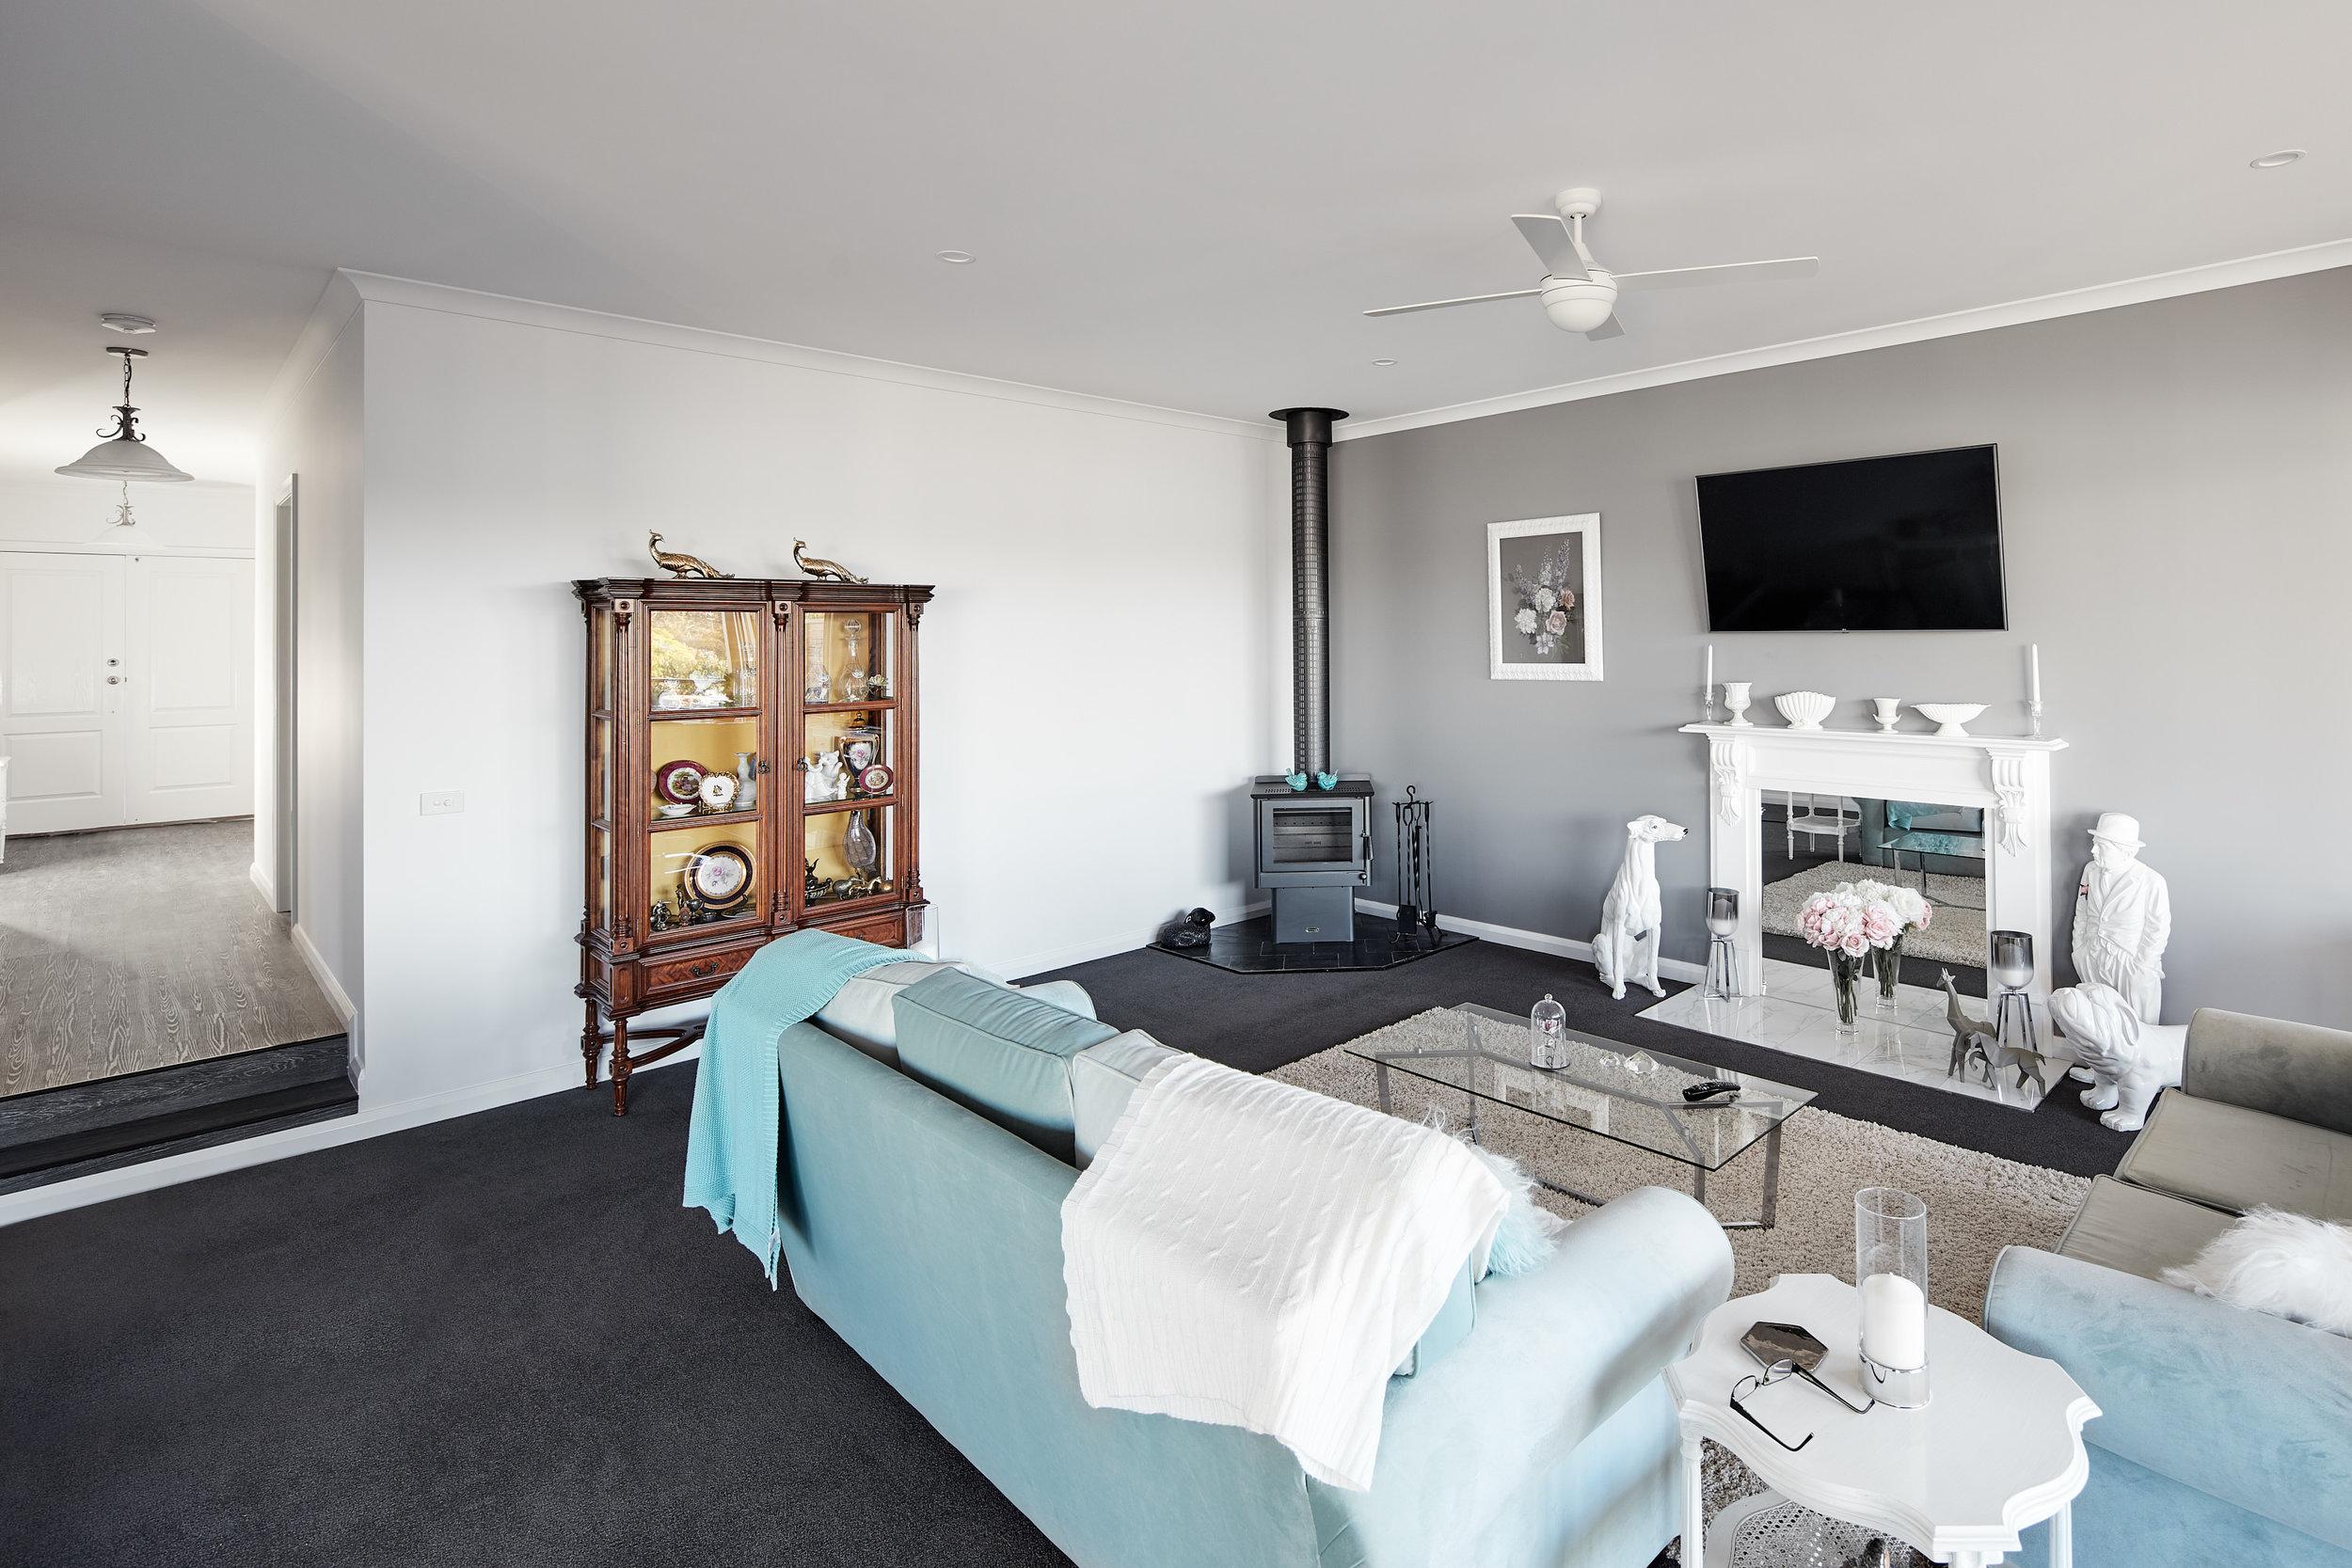 nathan-k-davis-nathankdavis-1nkd-architectural-photography-melbourne-victoria-australia-residential-4